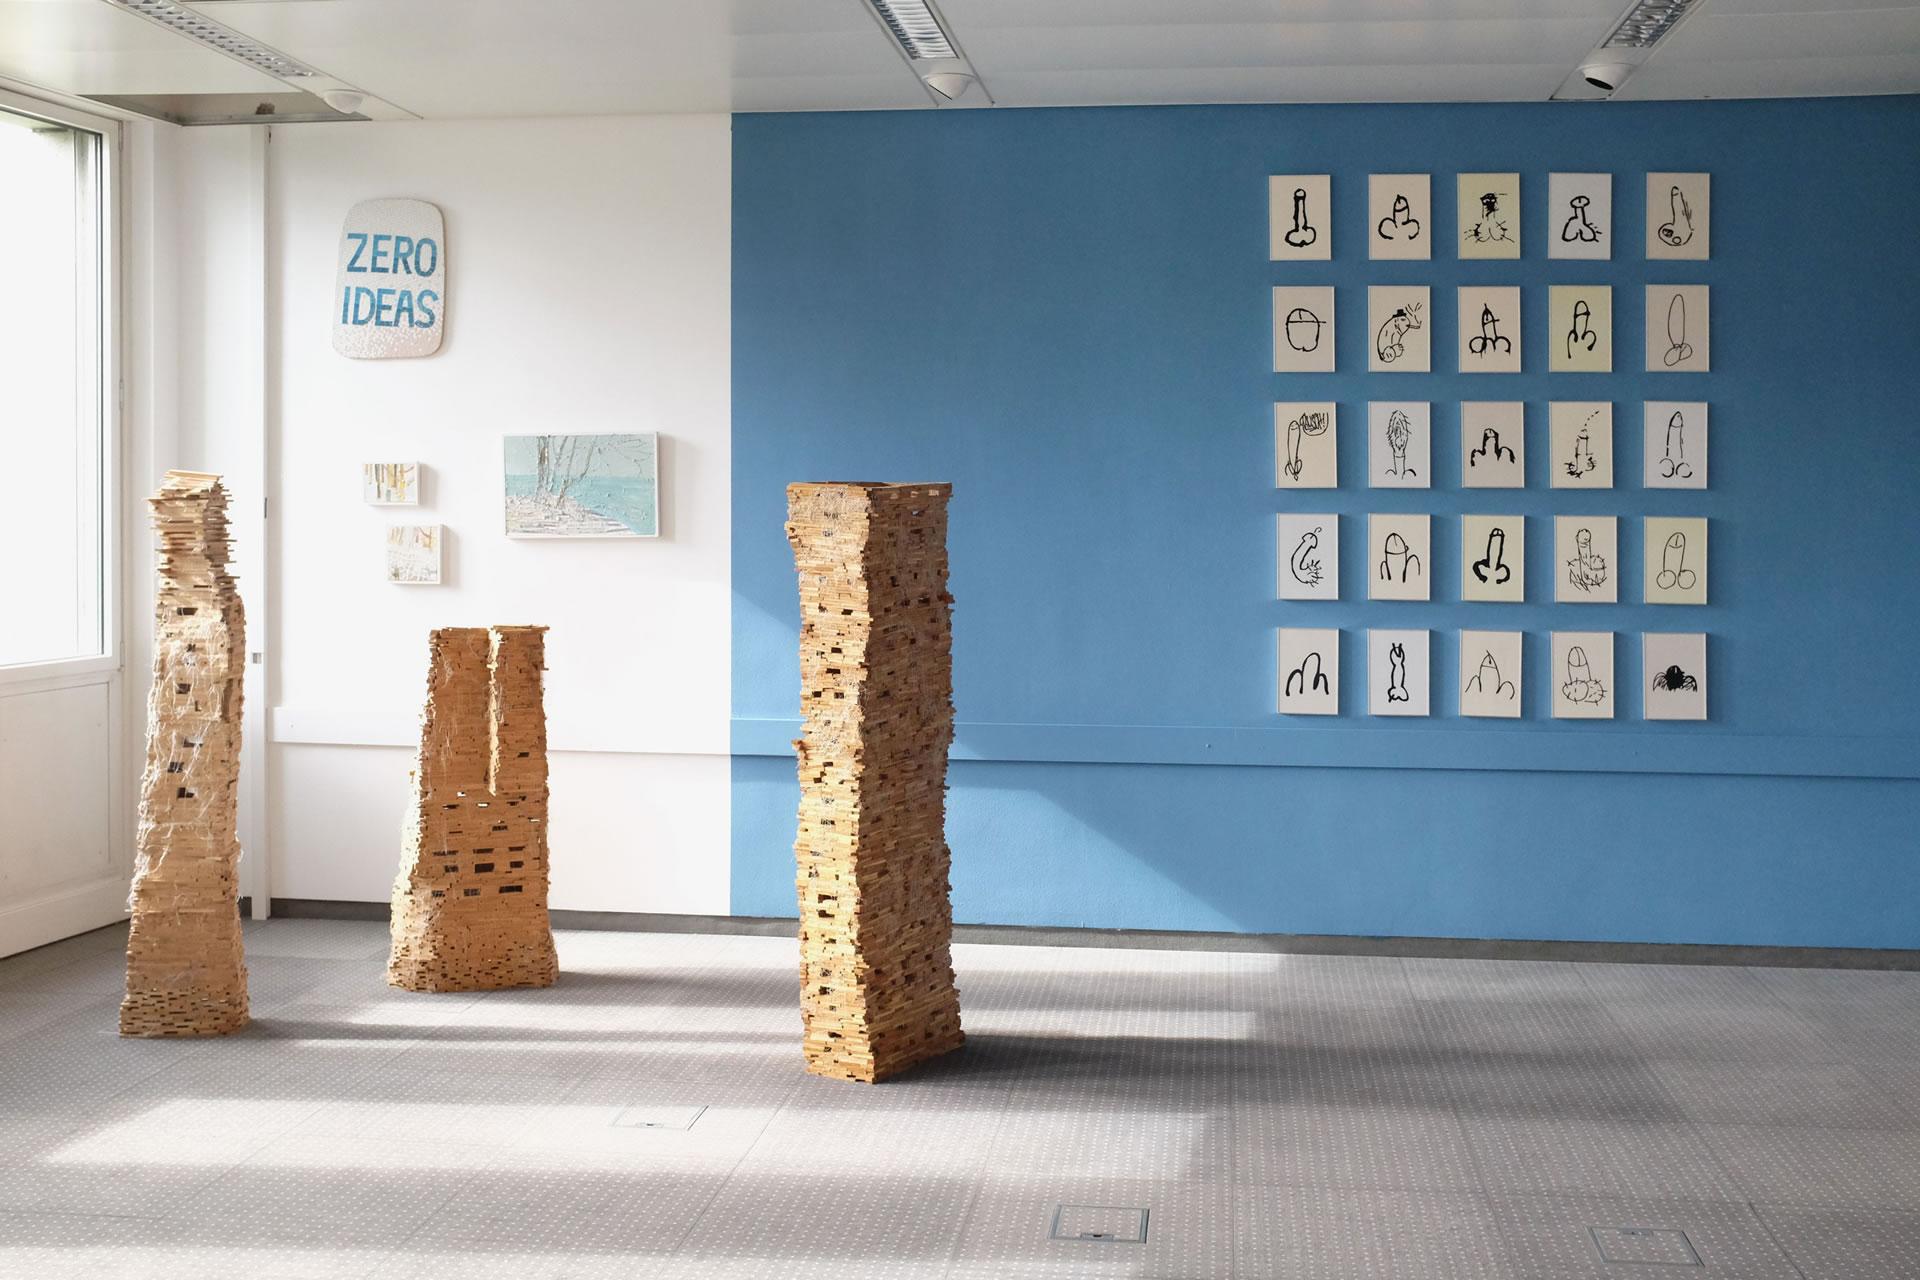 Parallel-2018-09-JosefLandl-AnthiaLoizou-AnnaKhodorkovskaya-EdithPayer-Galerie3-Flux23